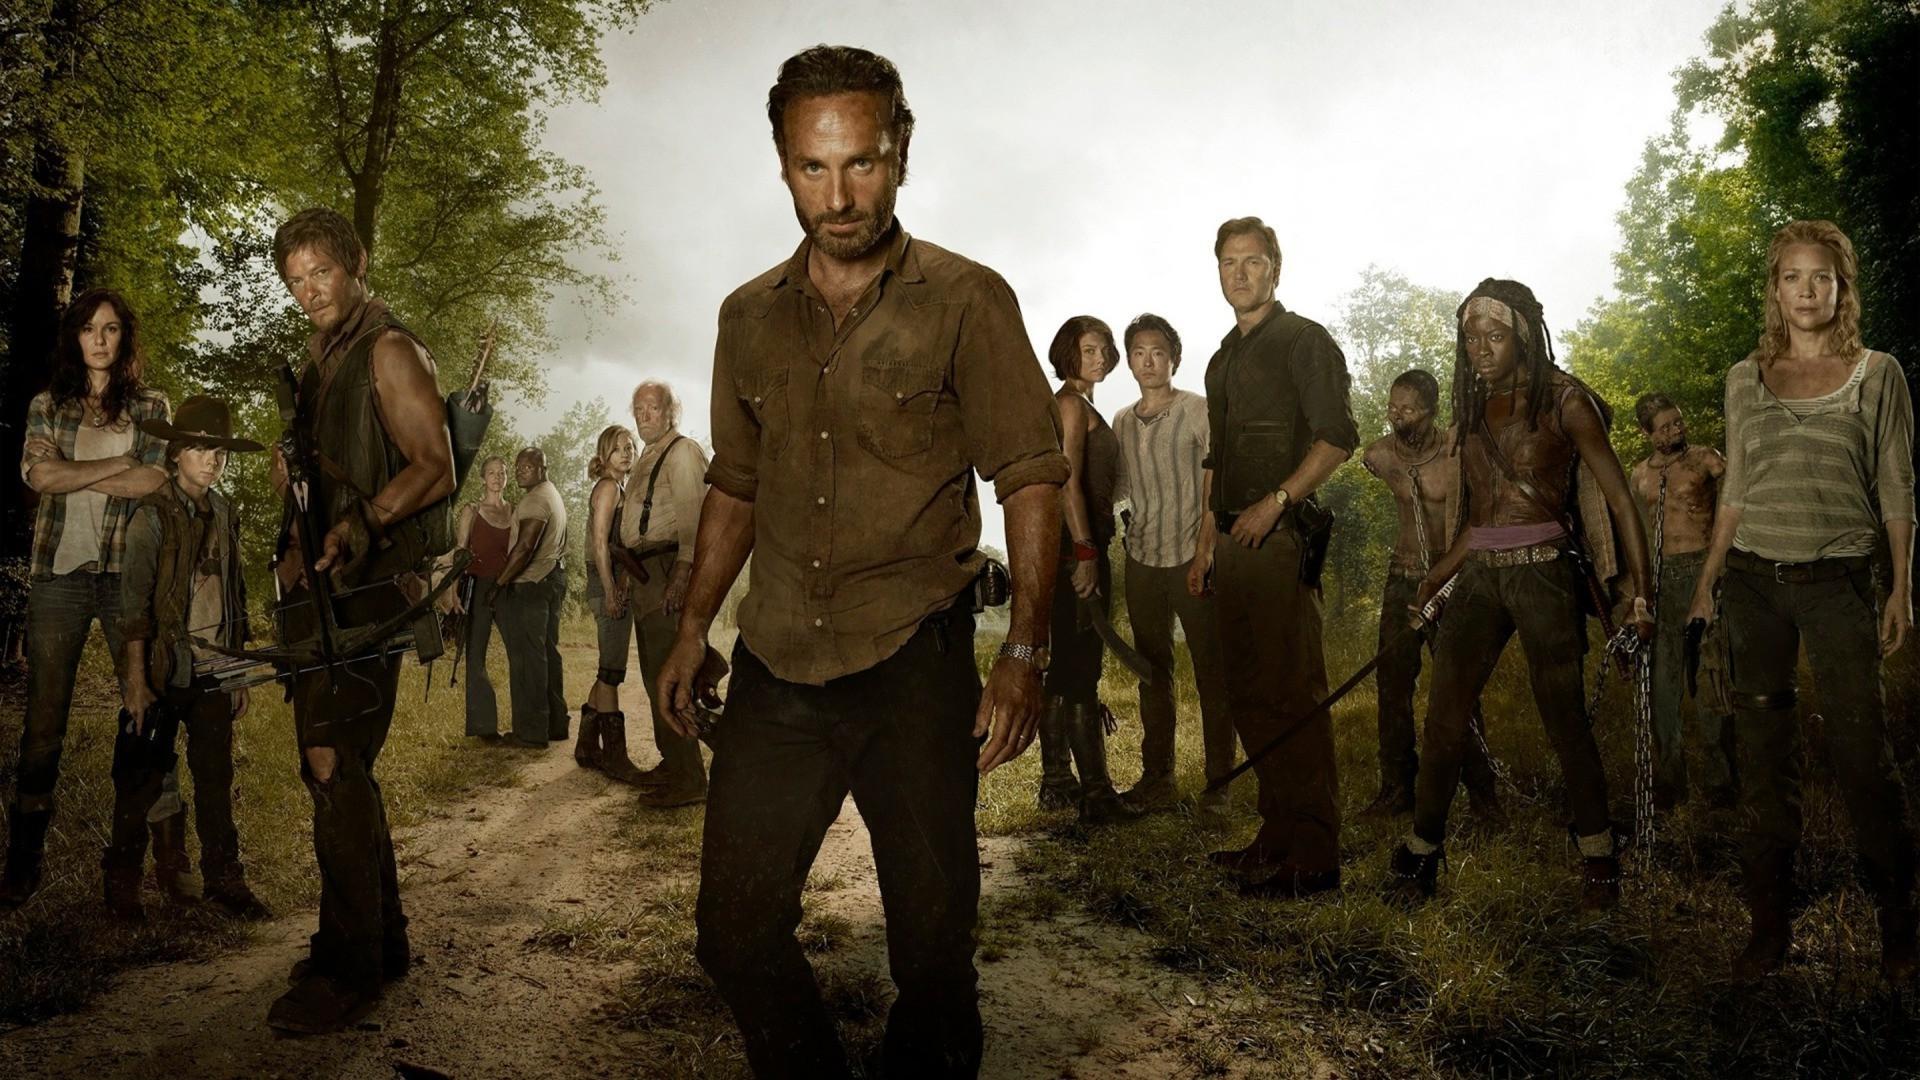 People The Walking Dead Person Rick Grimes Daryl Dixon Andrea Carl Michonne Screenshot 1920x1080 Px